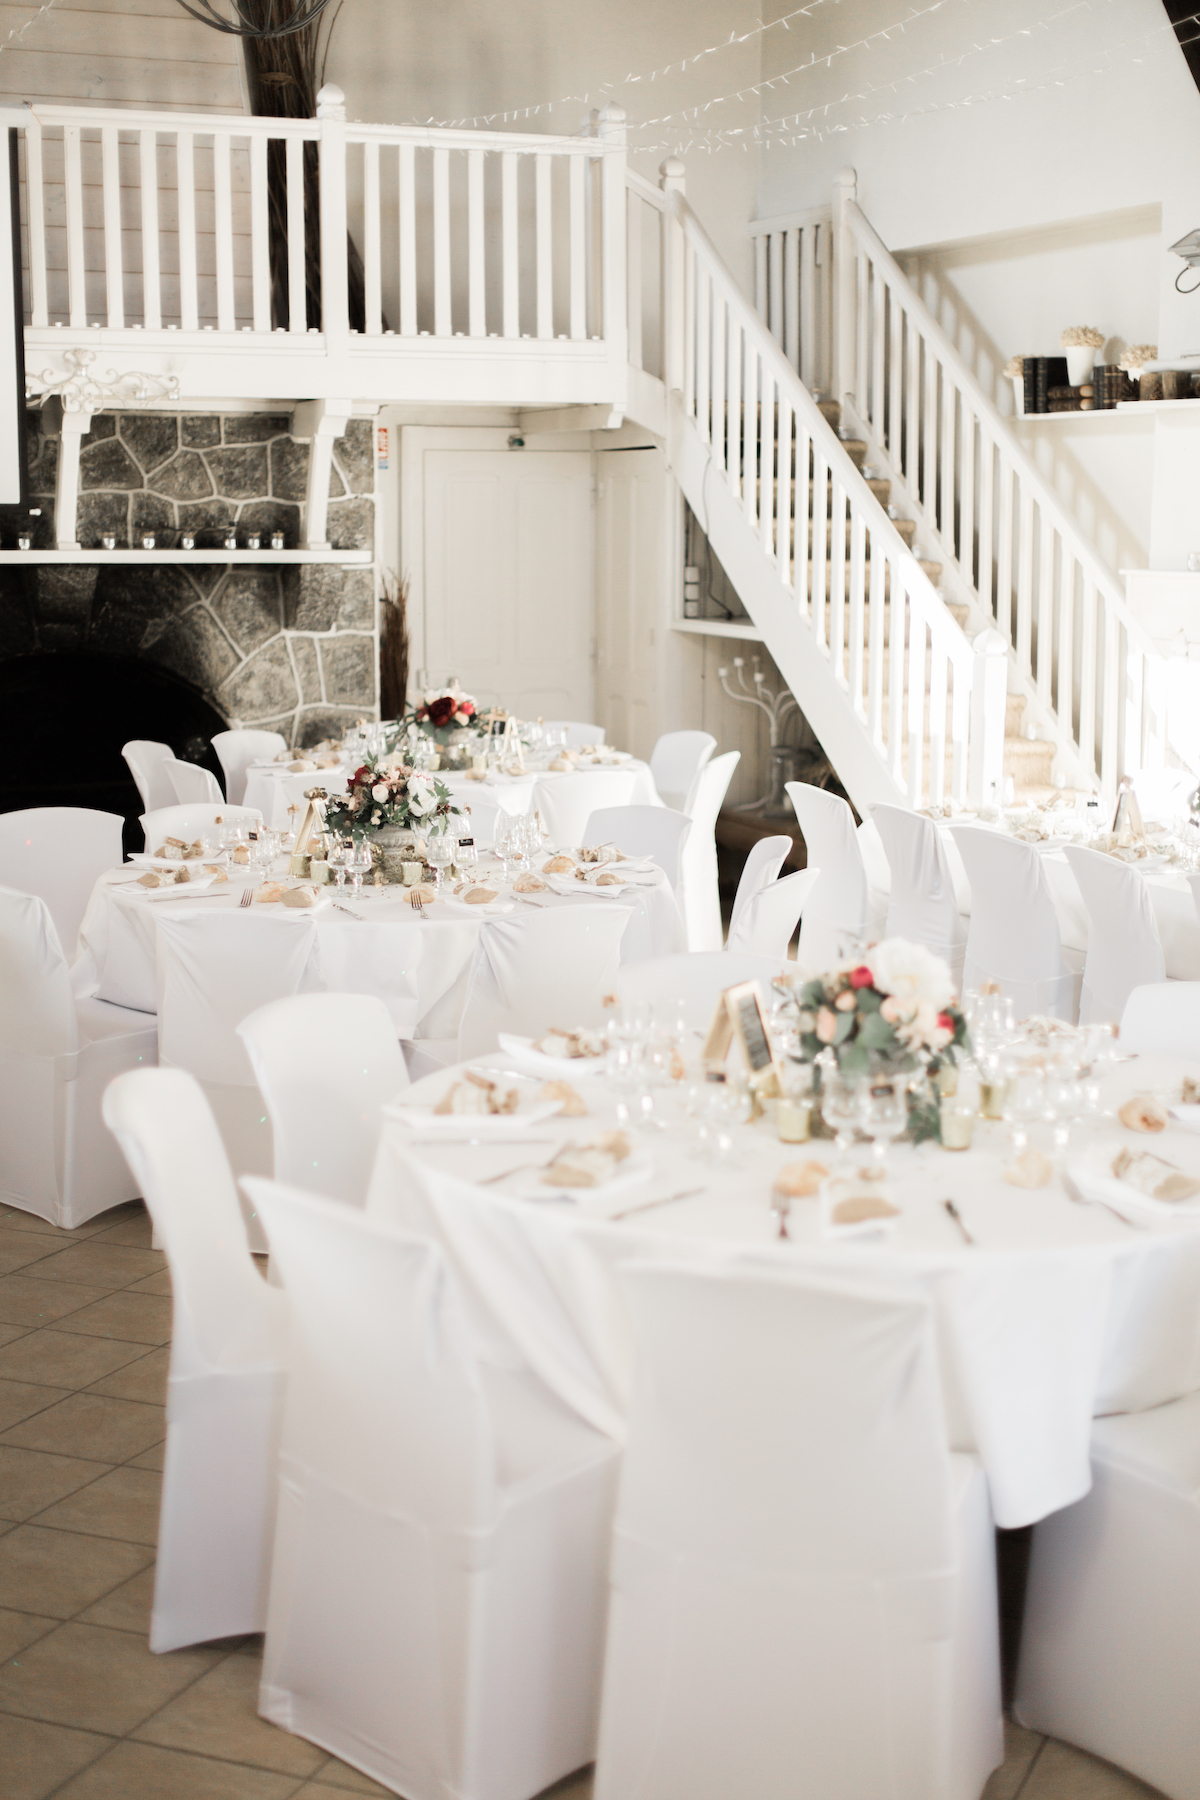 annecy-wedding-photos-175.jpg